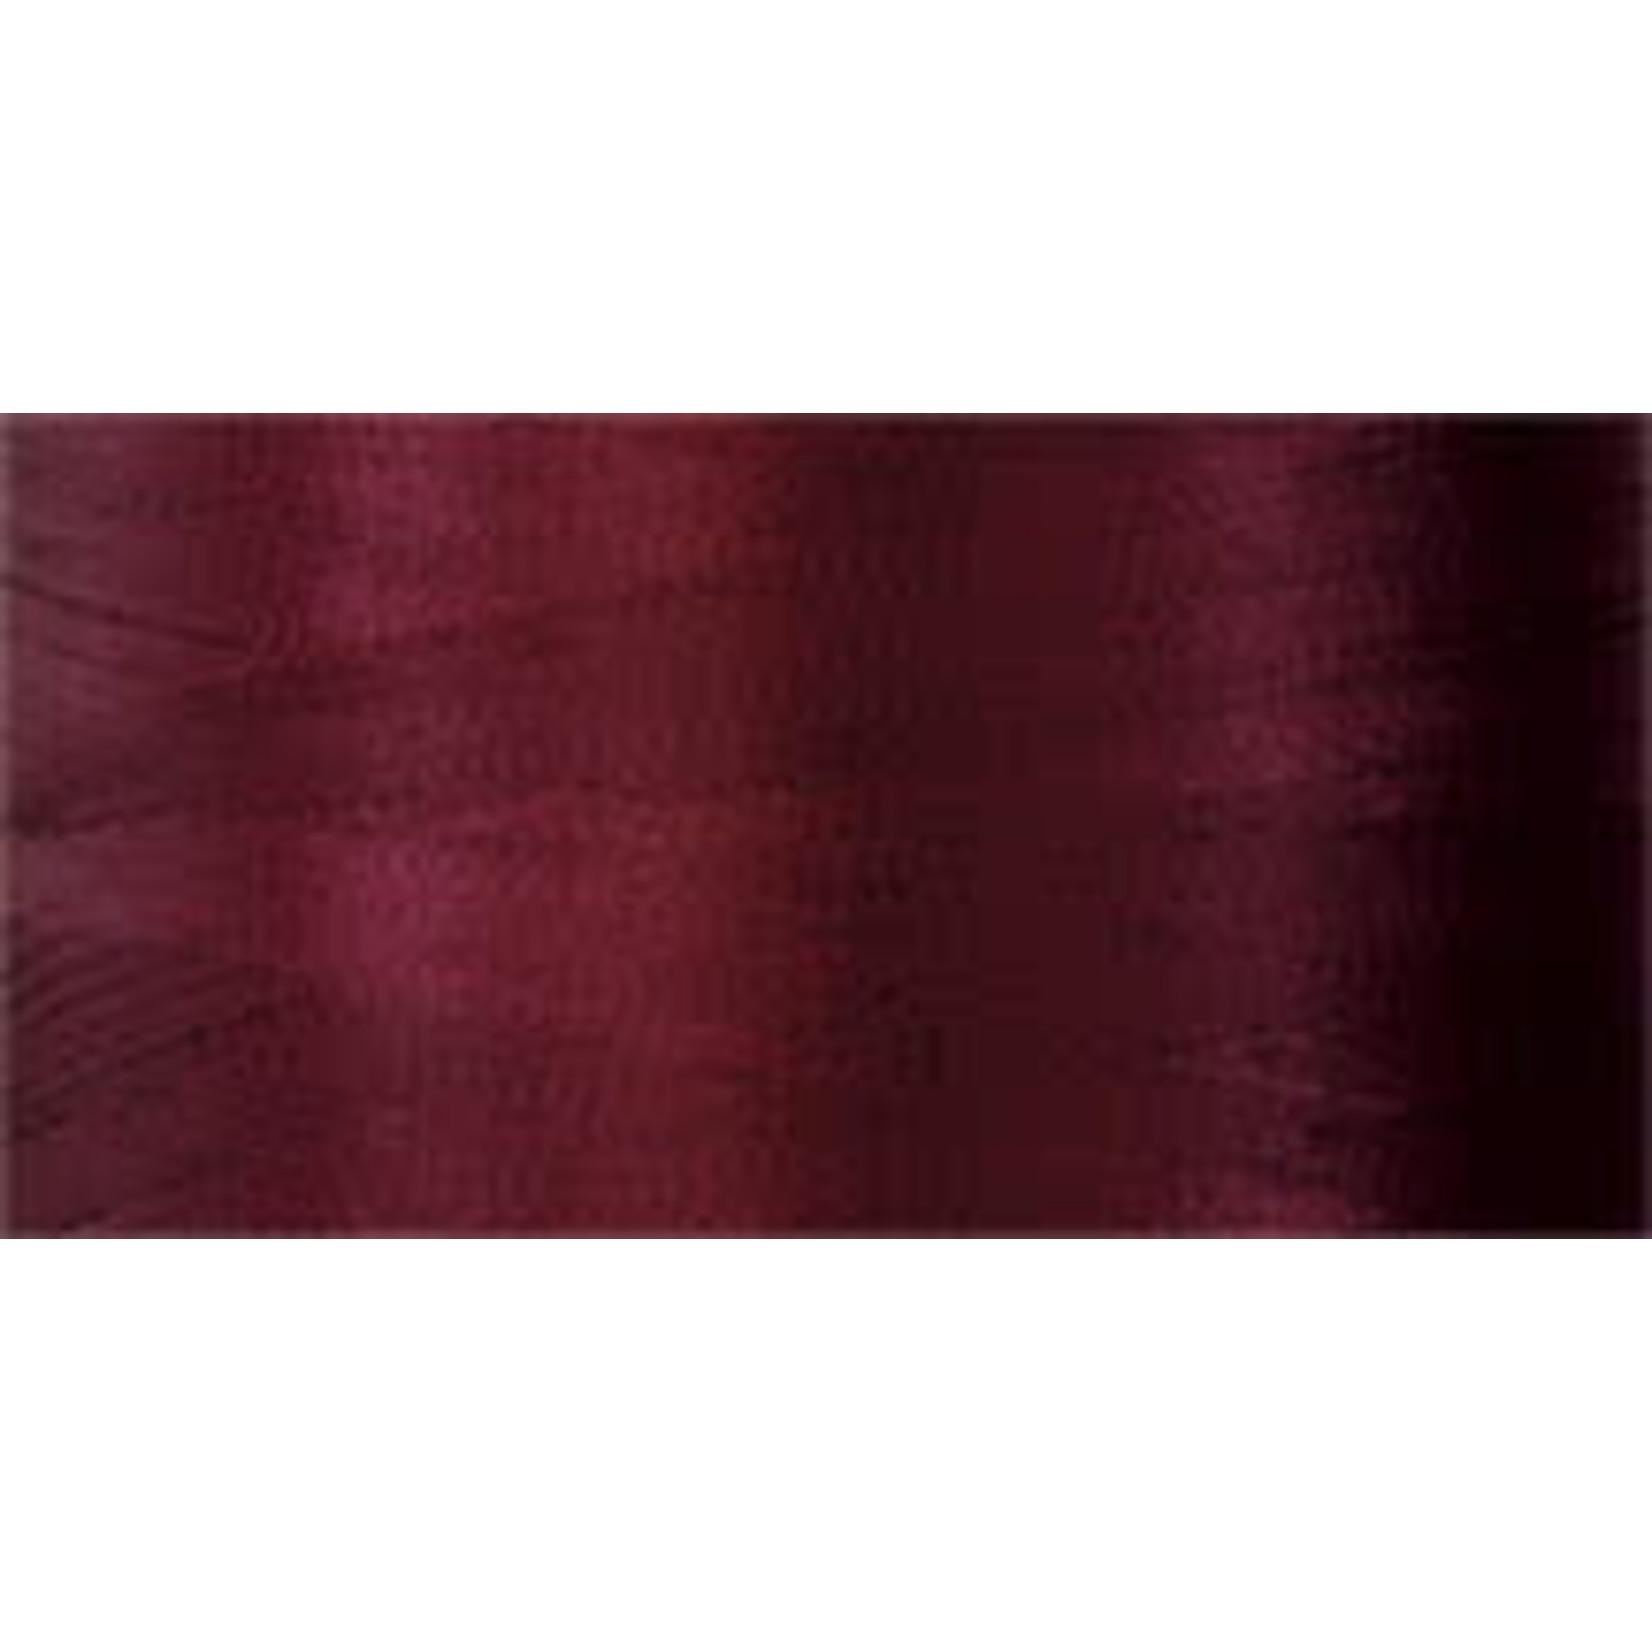 Superior Threads Bottom Line - #60 - 1300 m - 603 Red